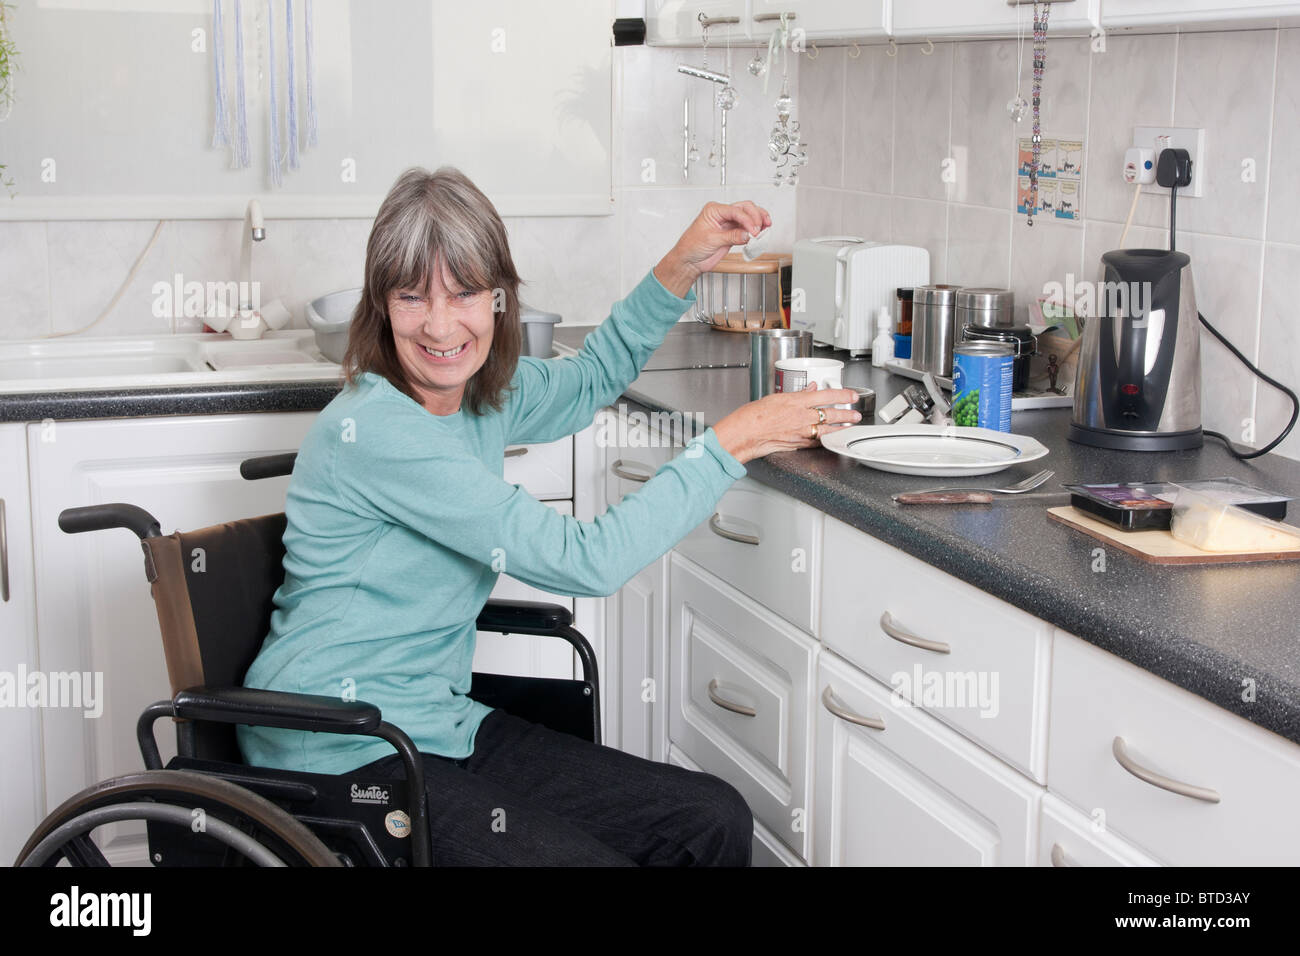 Portrait Woman Multiple Sclerosis In Stock Photos & Portrait Woman ...